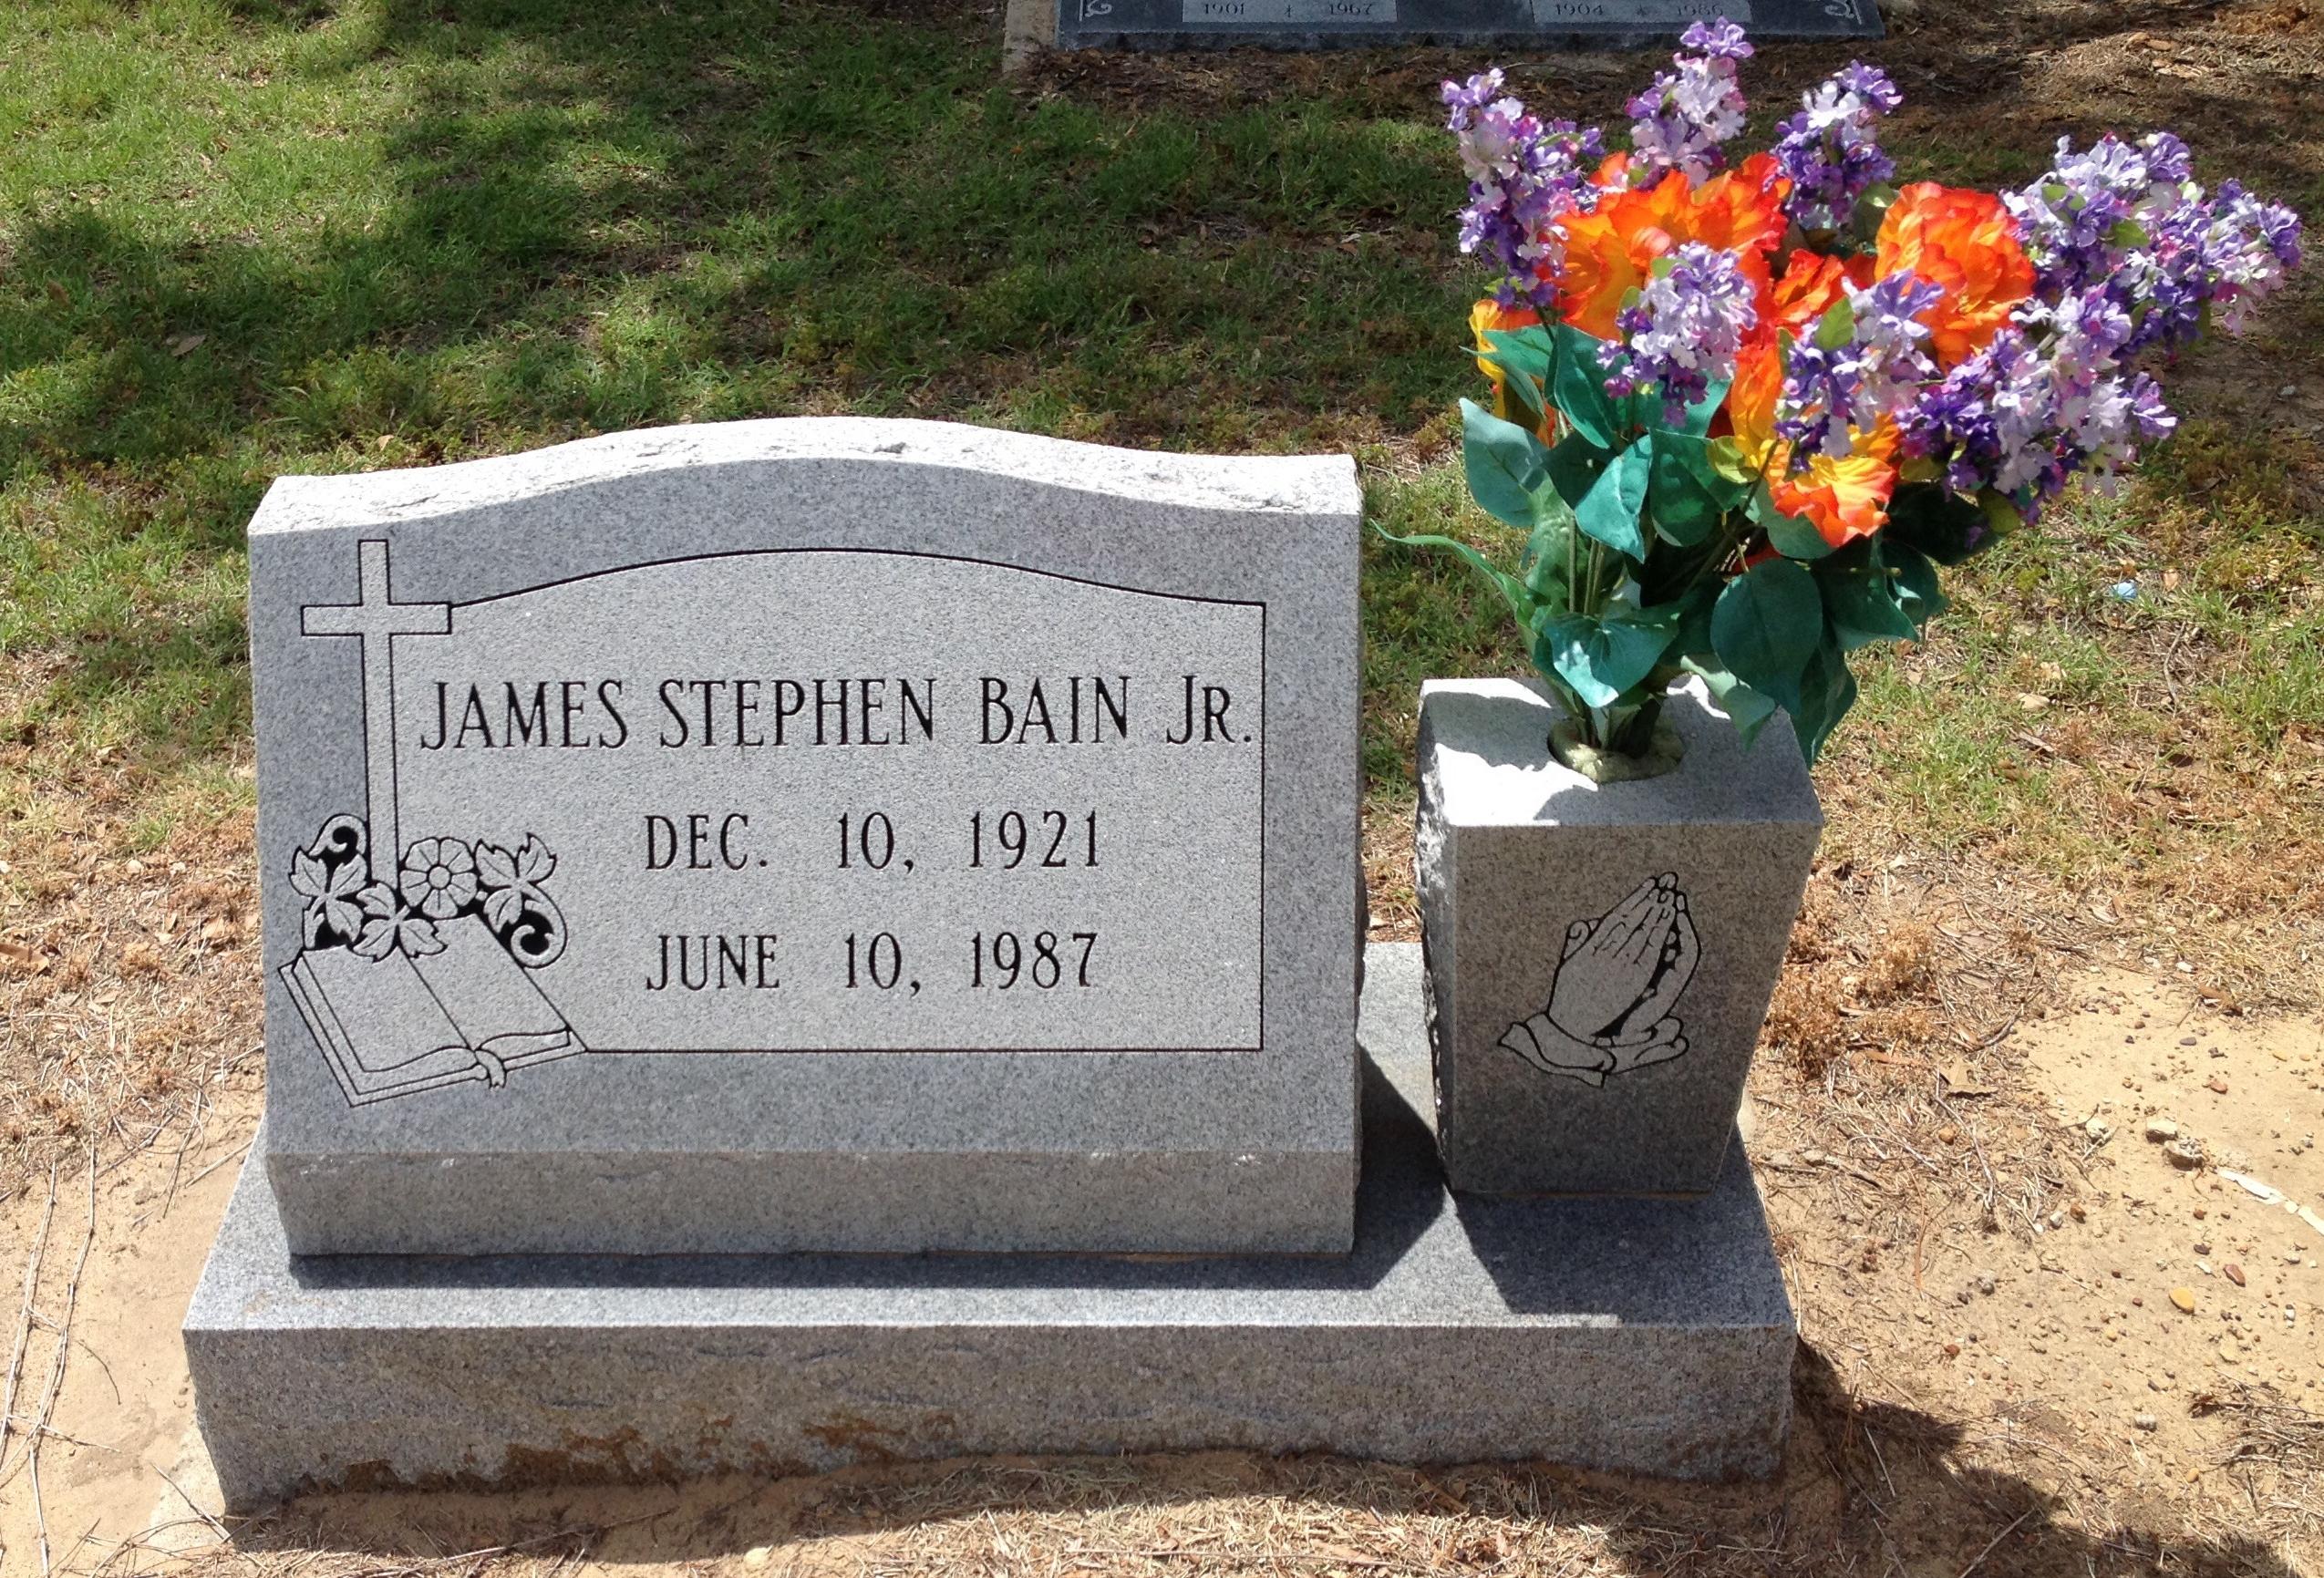 James Stephen Bain, Jr